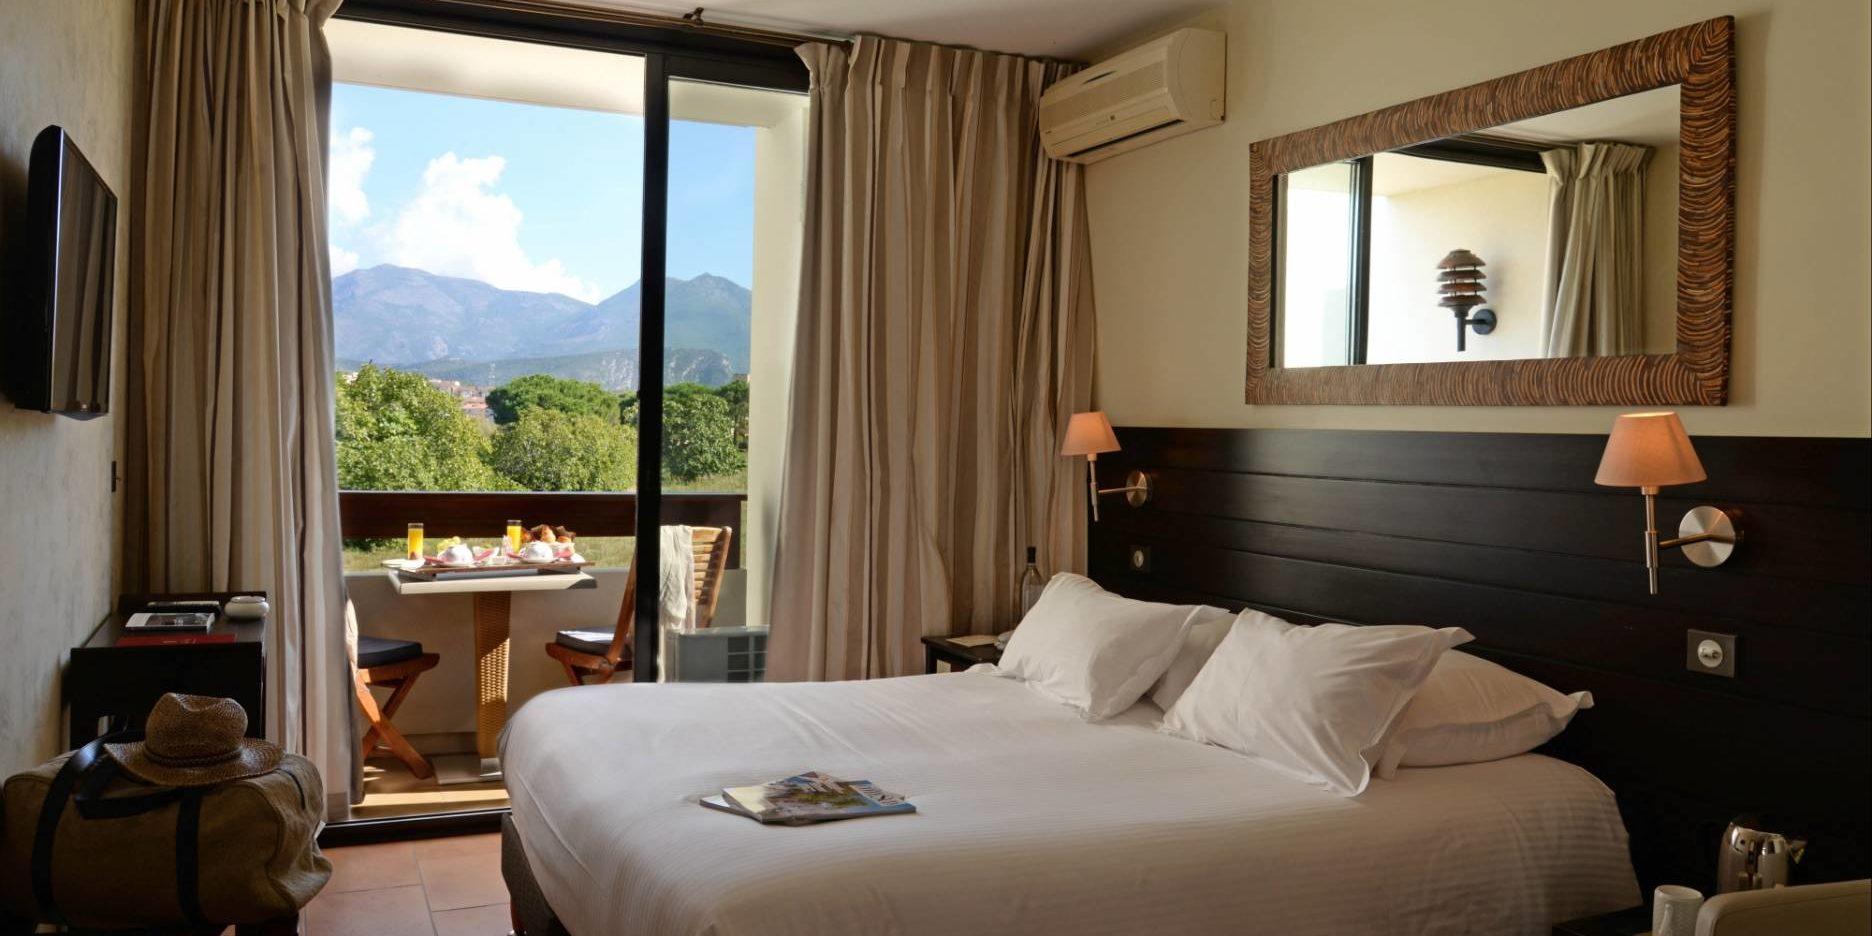 Hotel La Roya Saint-Florent Corsica Frankrijk kamer-Classique tweepersoonsbed balkon bergzicht